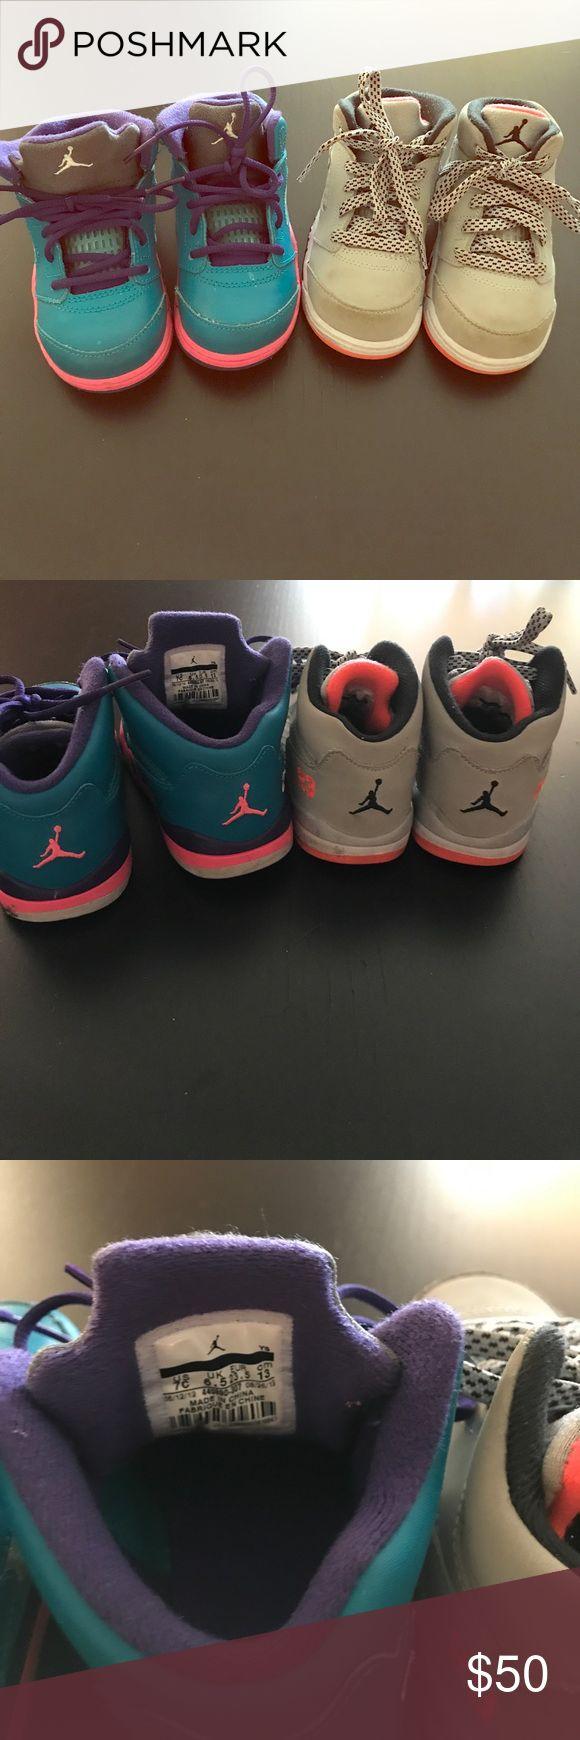 Toddler Jordan sneakers Size 7C toddler Jordan sneakers one teal blue with pink and one gray with bright orange trim. Jordan Shoes Sneakers